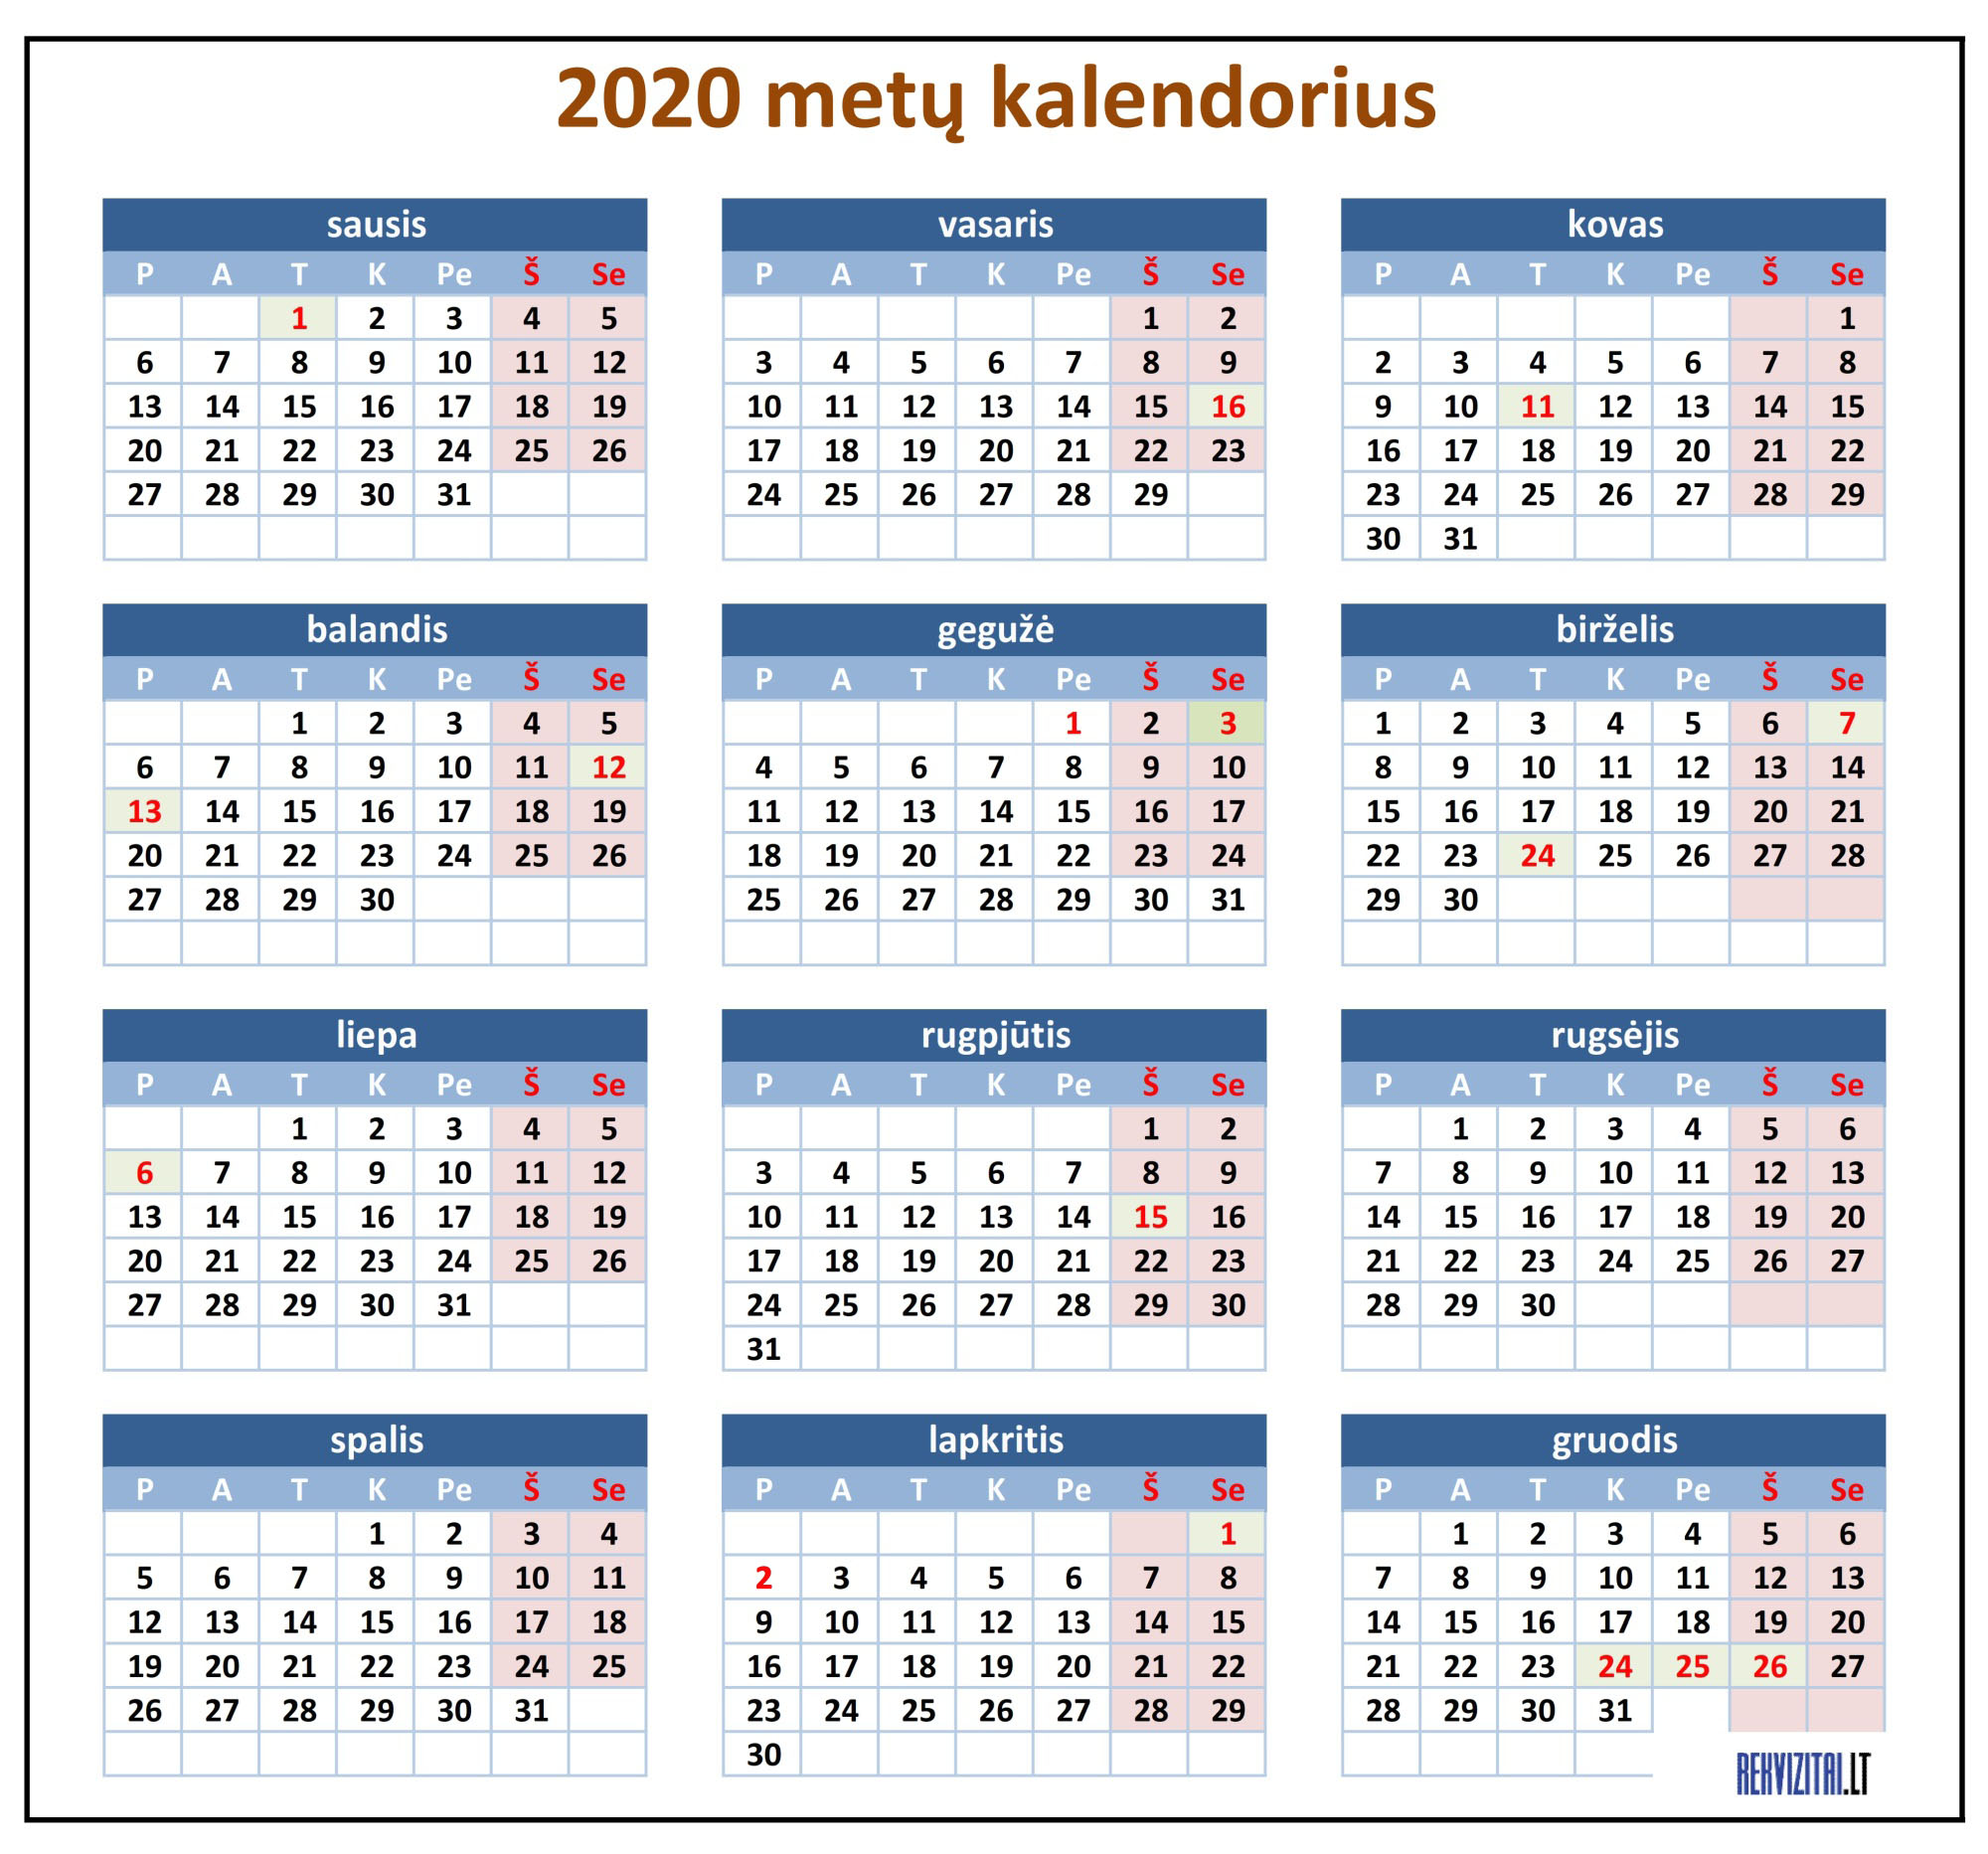 2020 metu kalendorius